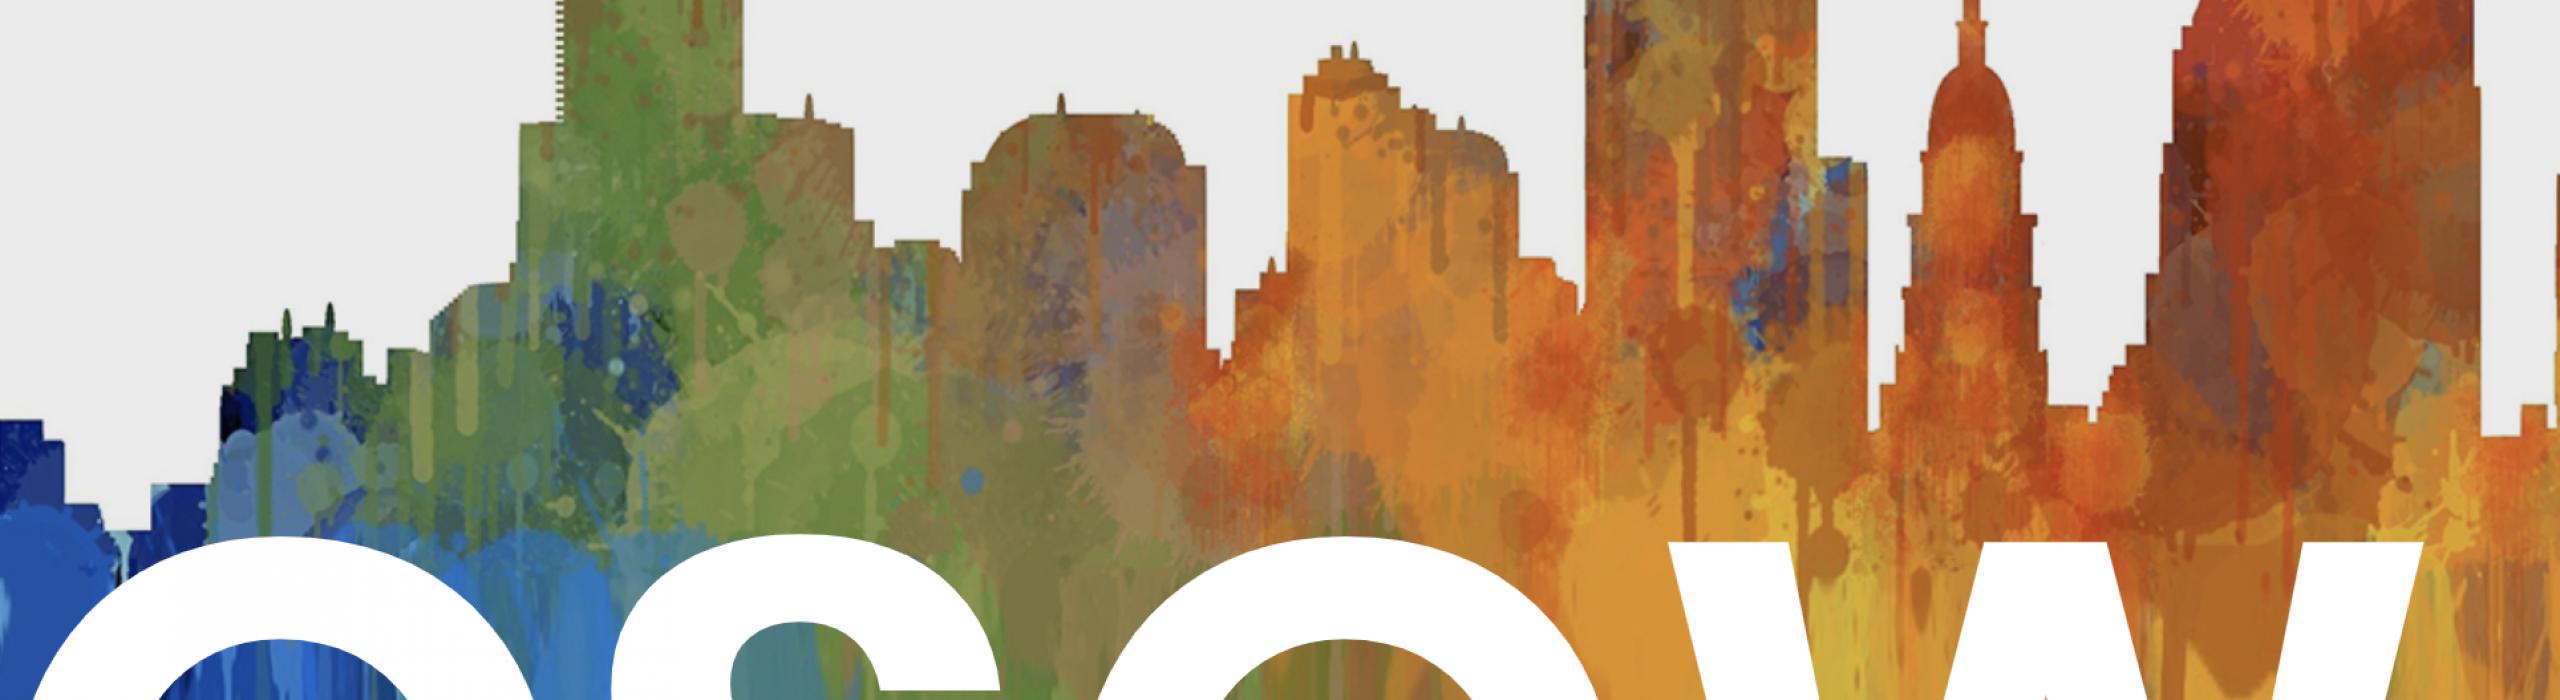 CSCW 2019 logo